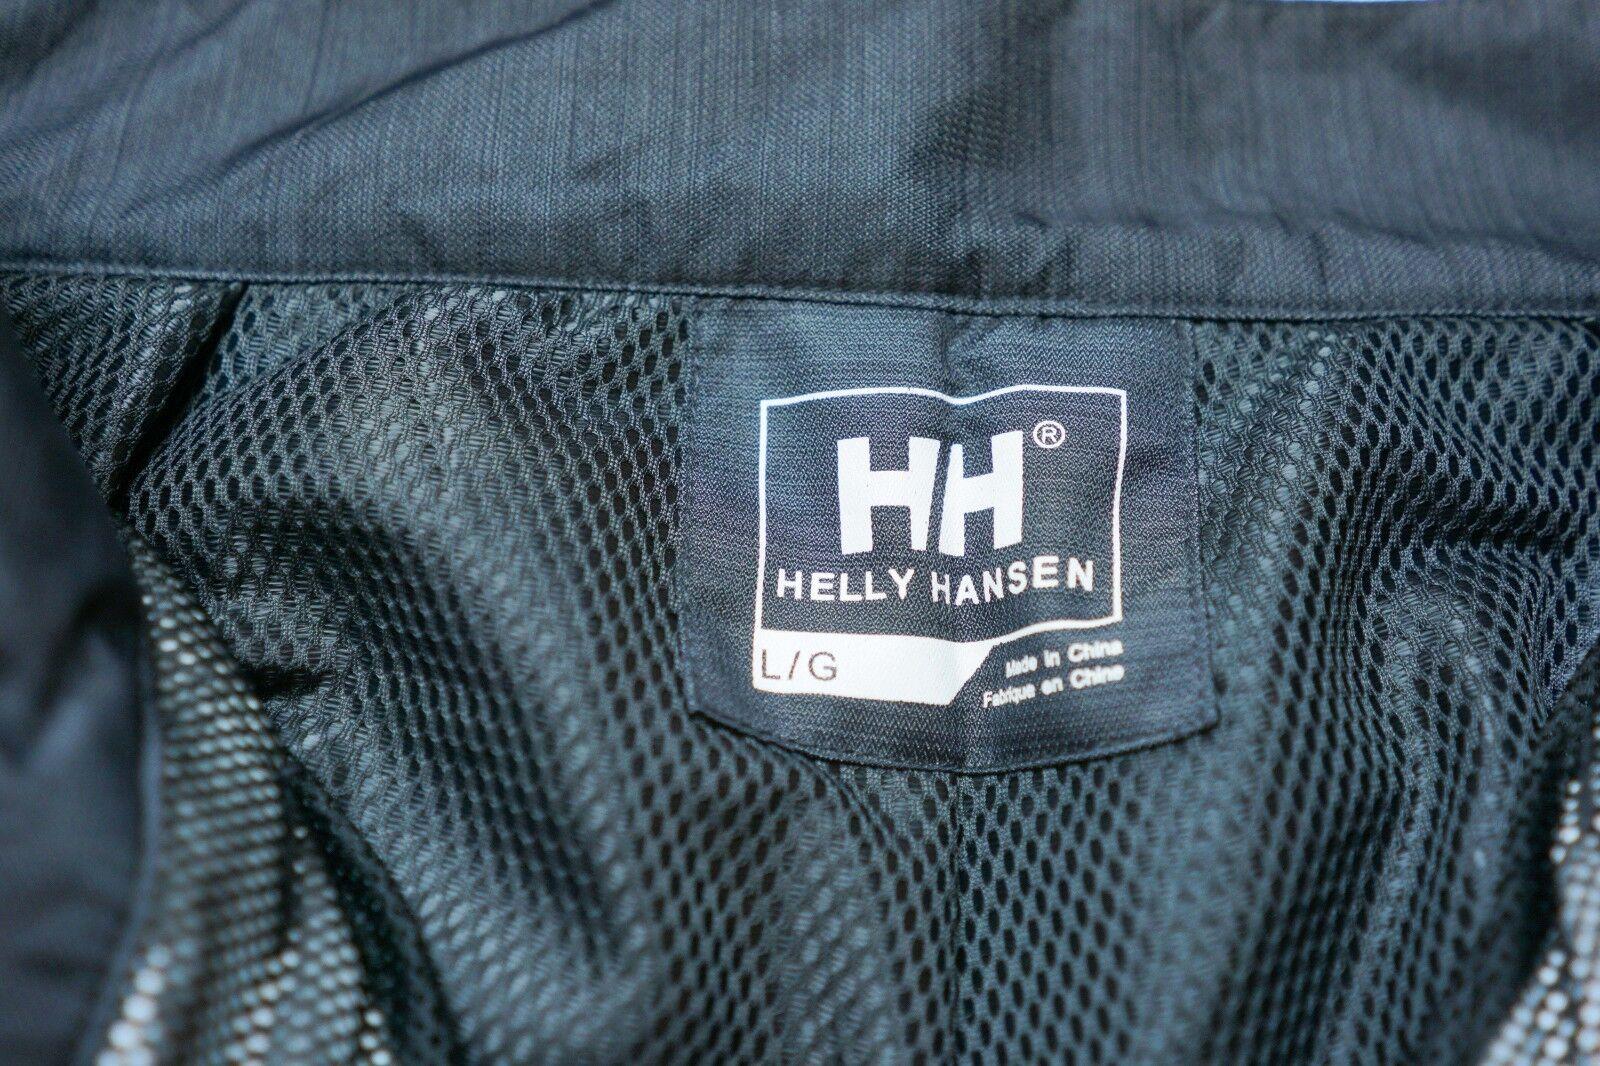 Damen Helly Hansen Hose Hellytech Snowboarding Skifahren L W30 L32 L32 L32 XIJ437 f3131e